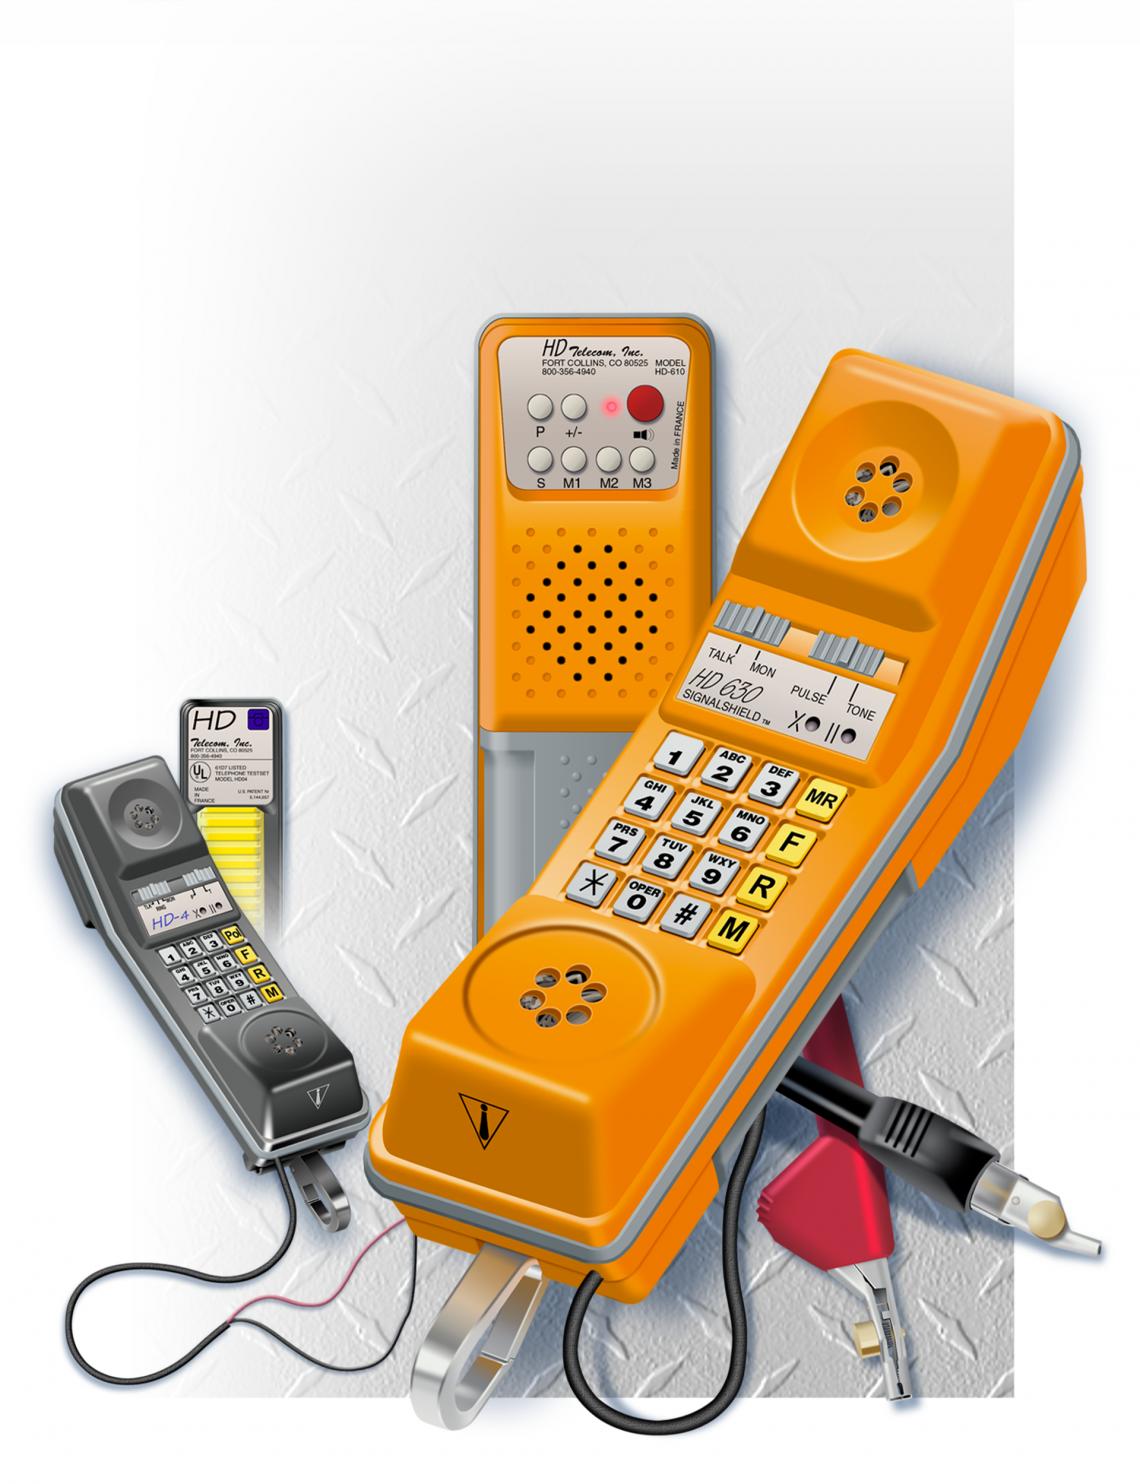 Telecom Handheld Test Equipment – product illustration